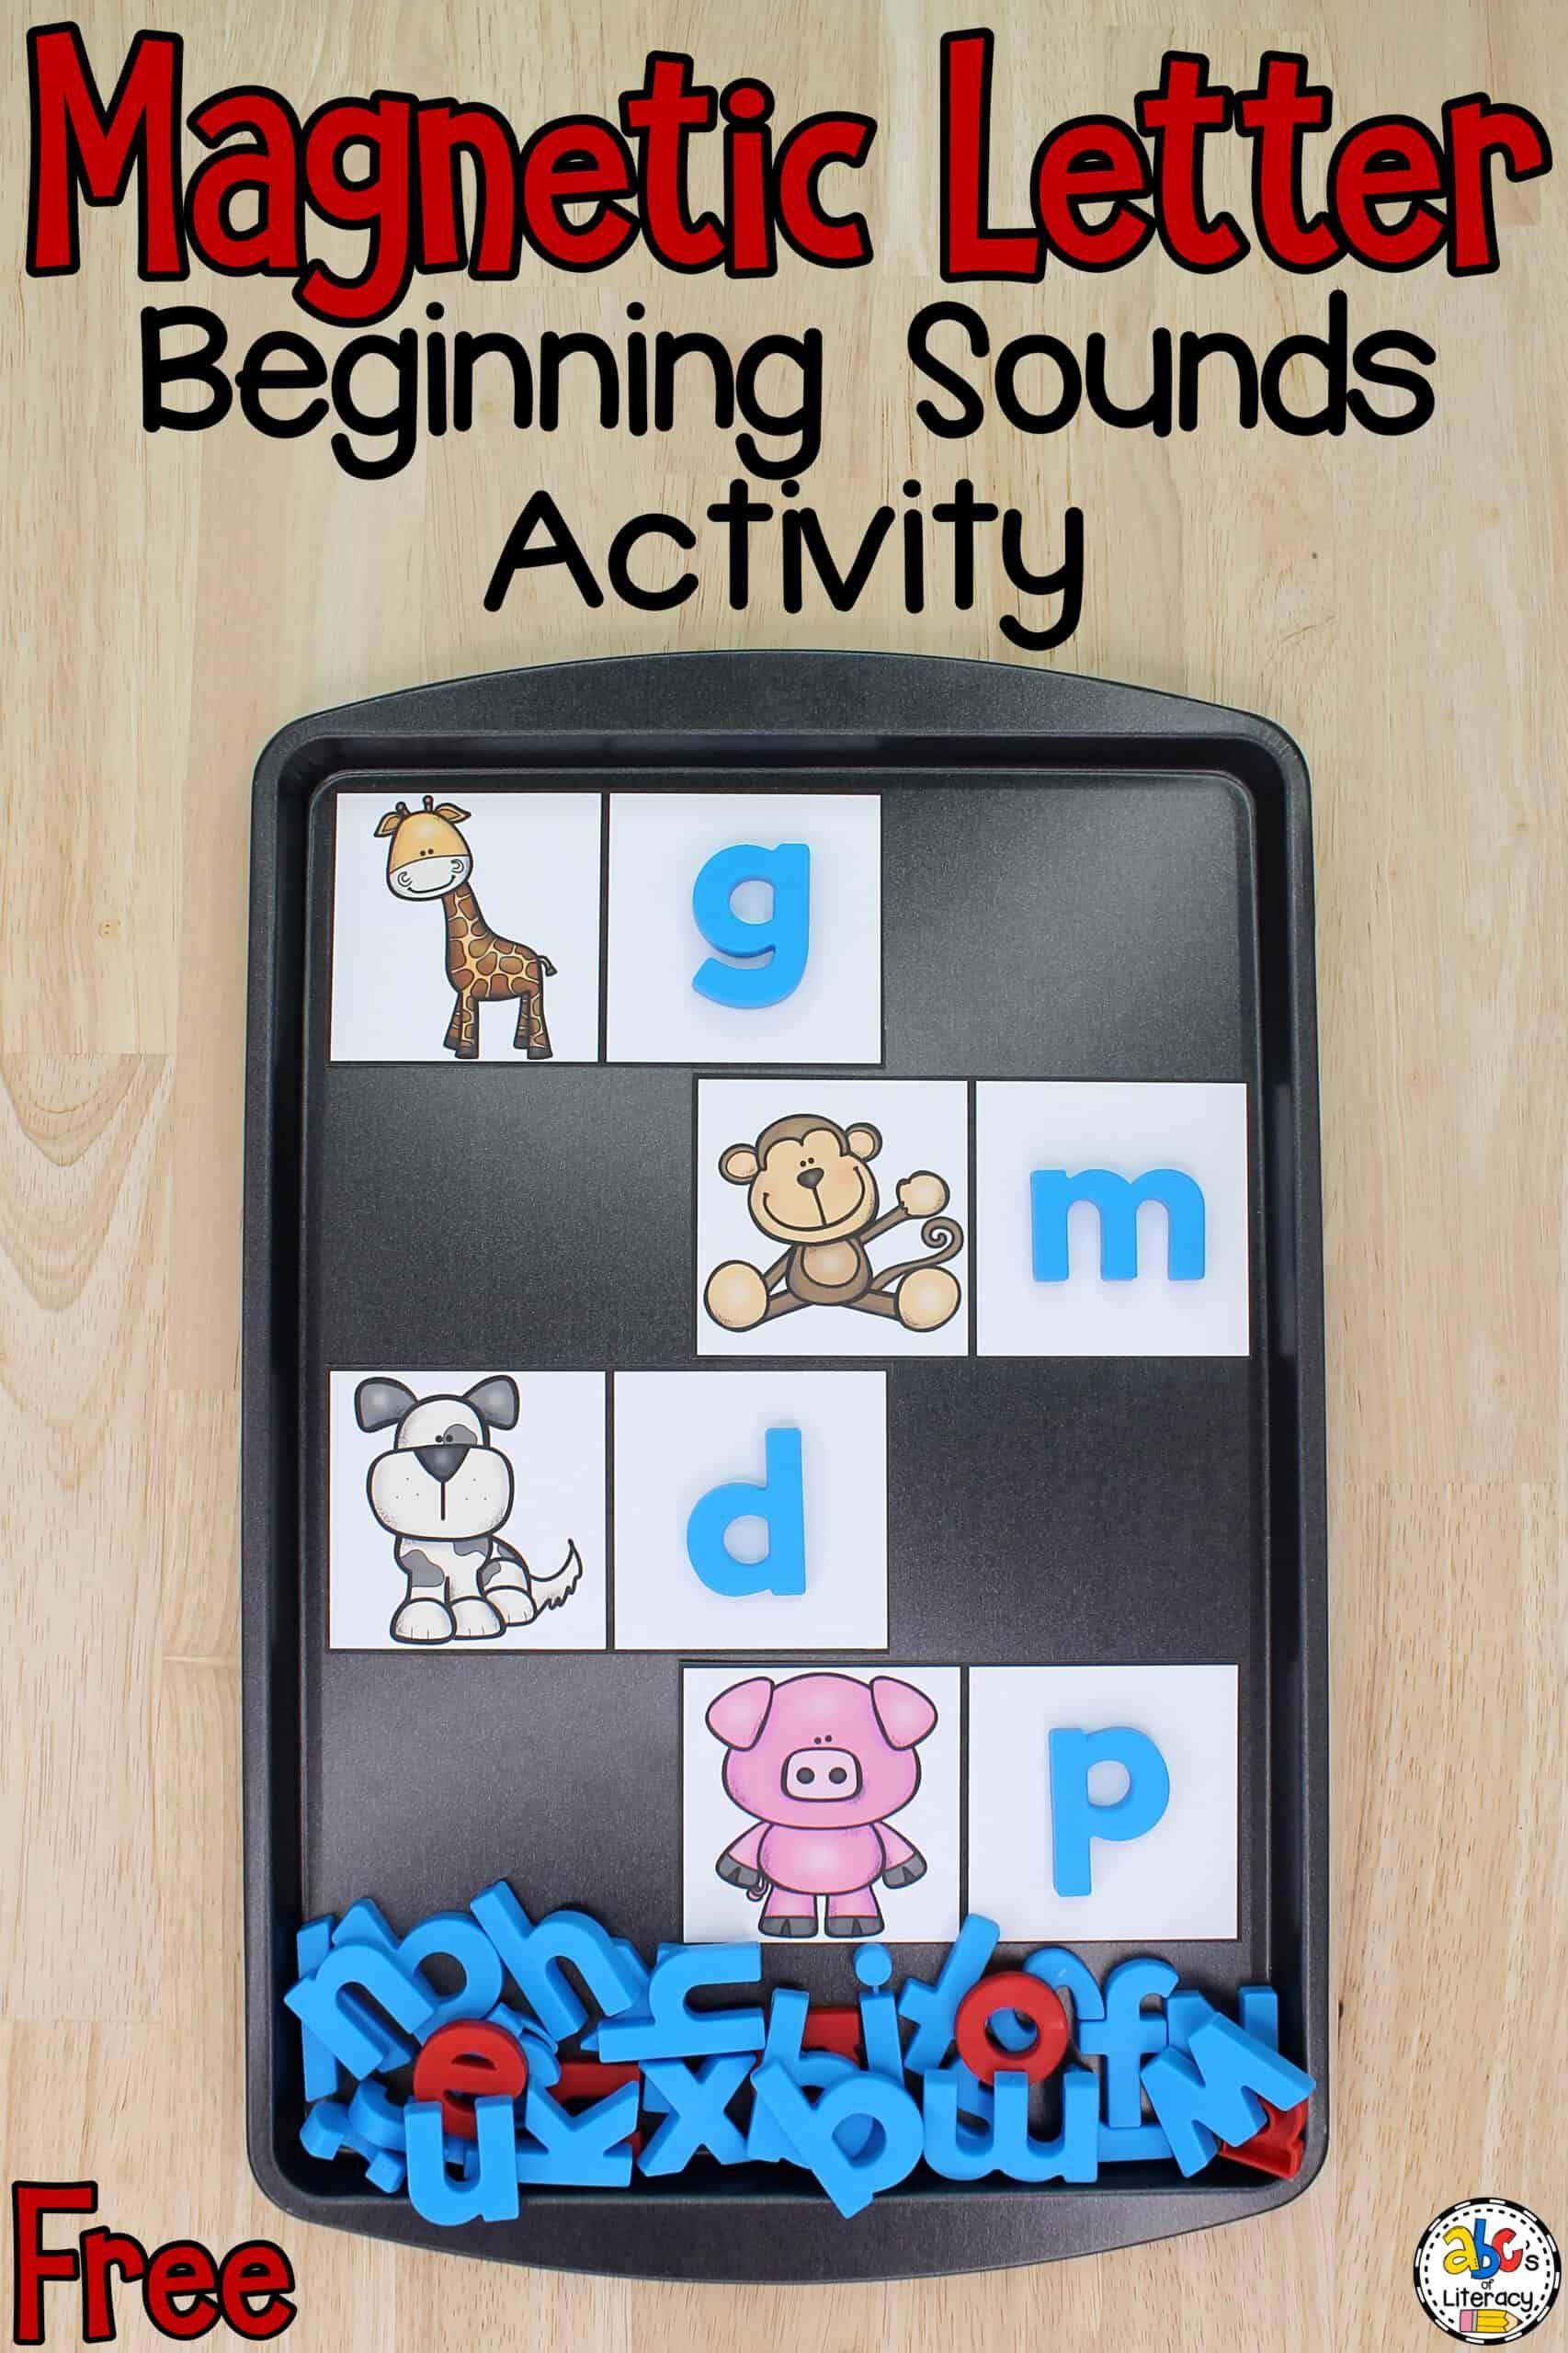 Magnetic Letter Beginning Sounds Activity For Beginning